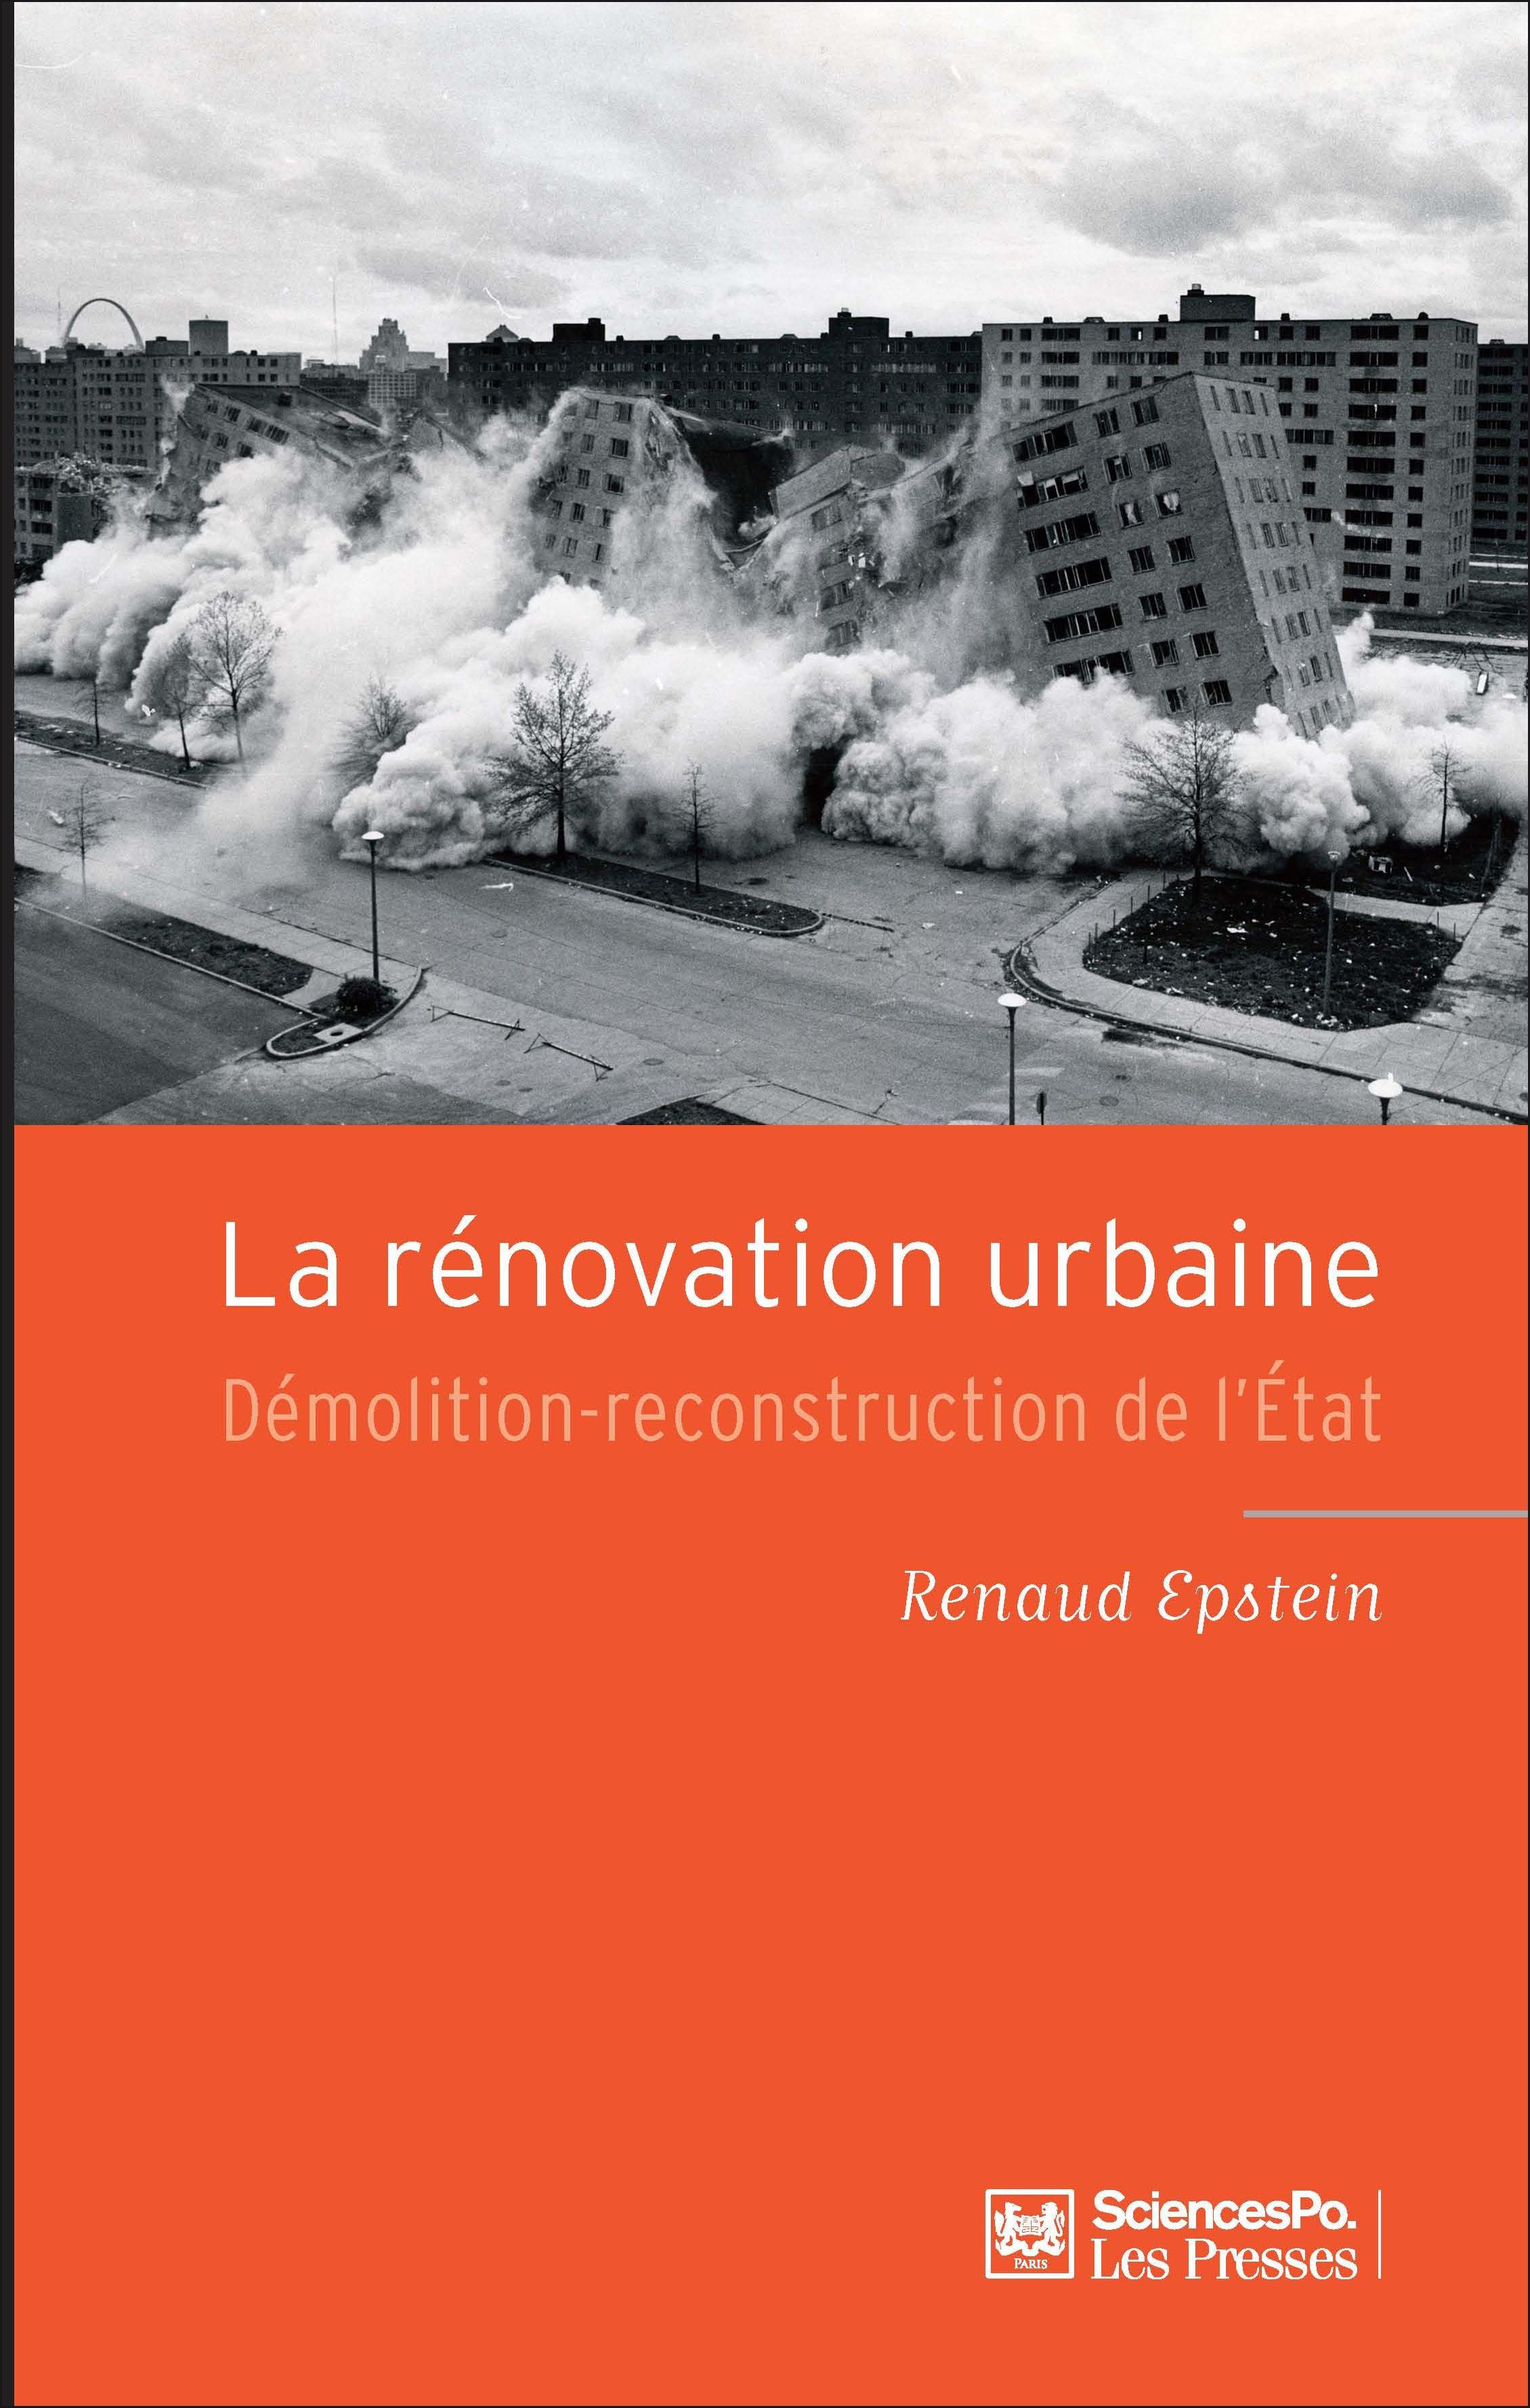 la rénovation urbaine renaud epstein